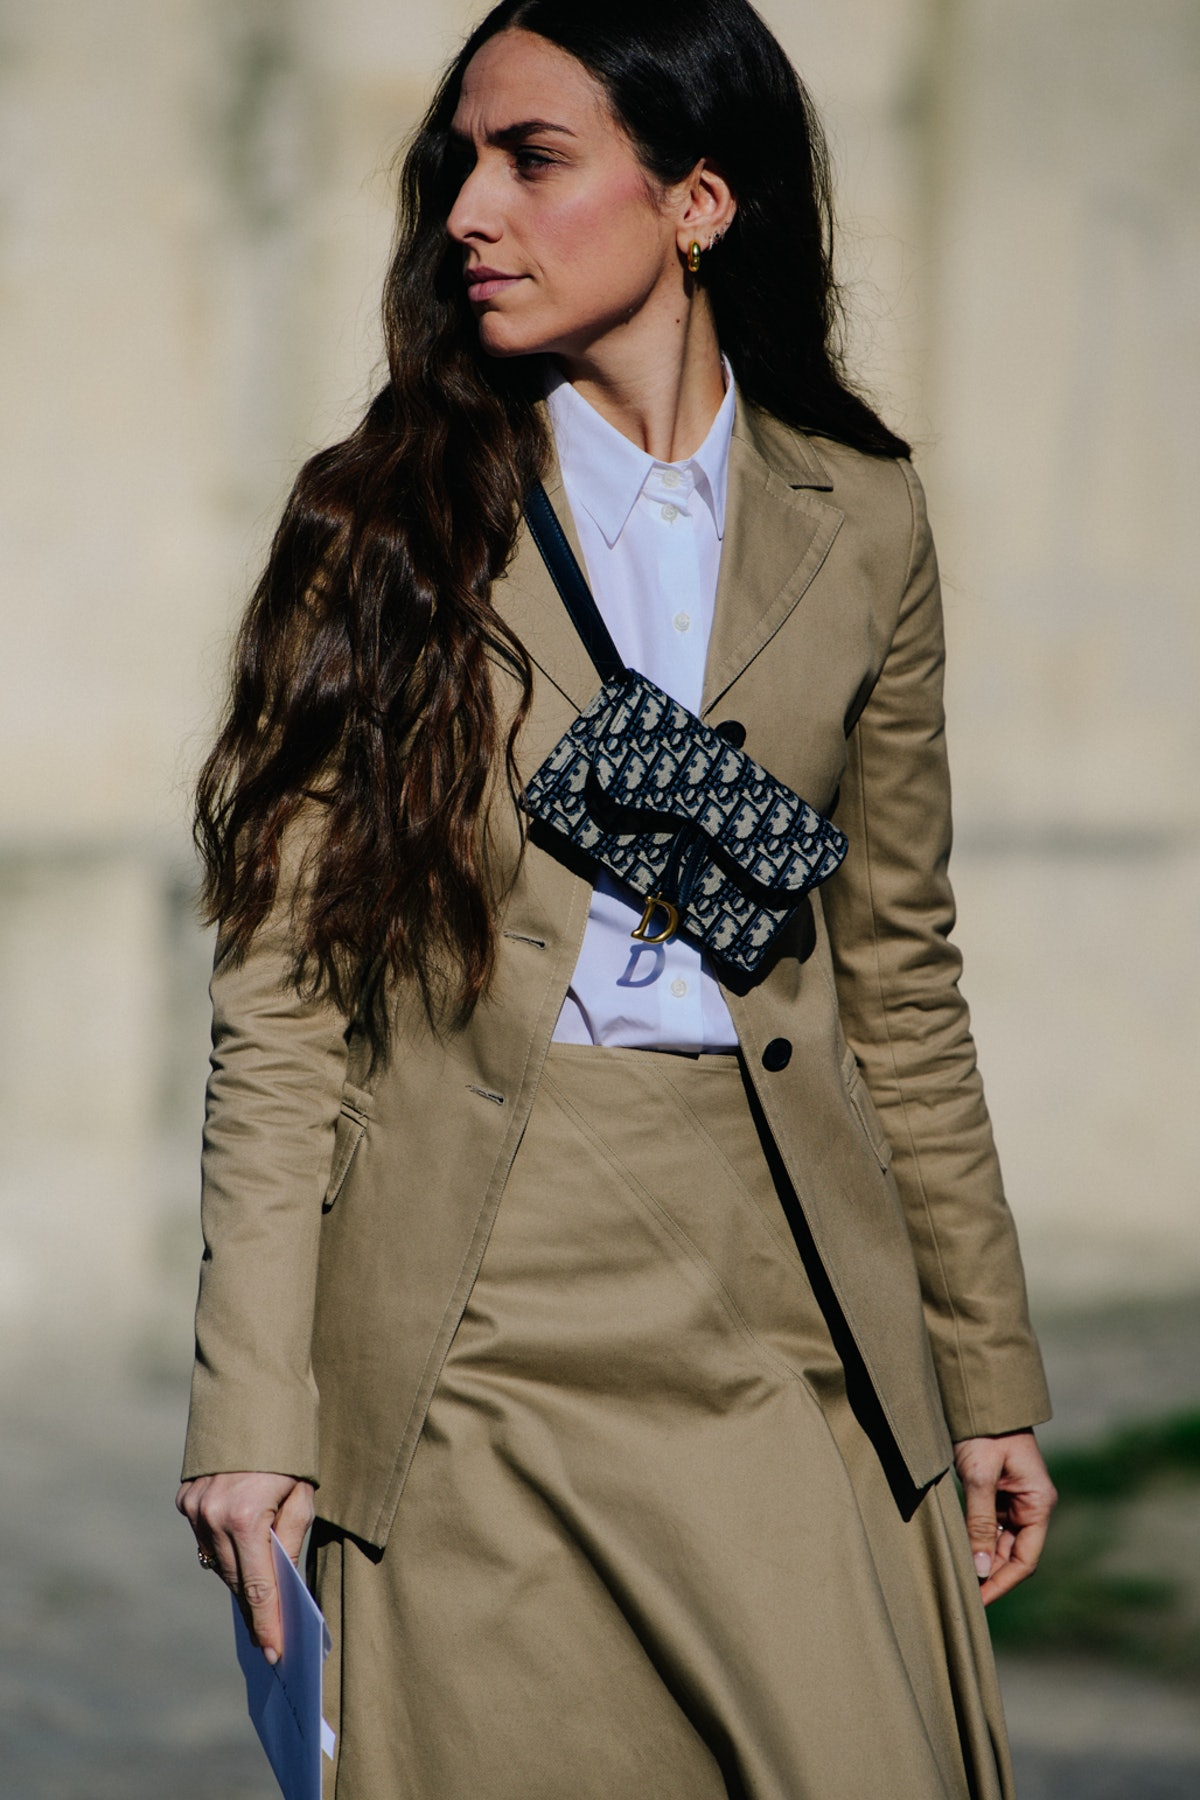 Adam-Katz-Sinding-W-Magazine-Paris-Fashion-Week-Fall-Winter-2019-2020_AKS3571.jpg